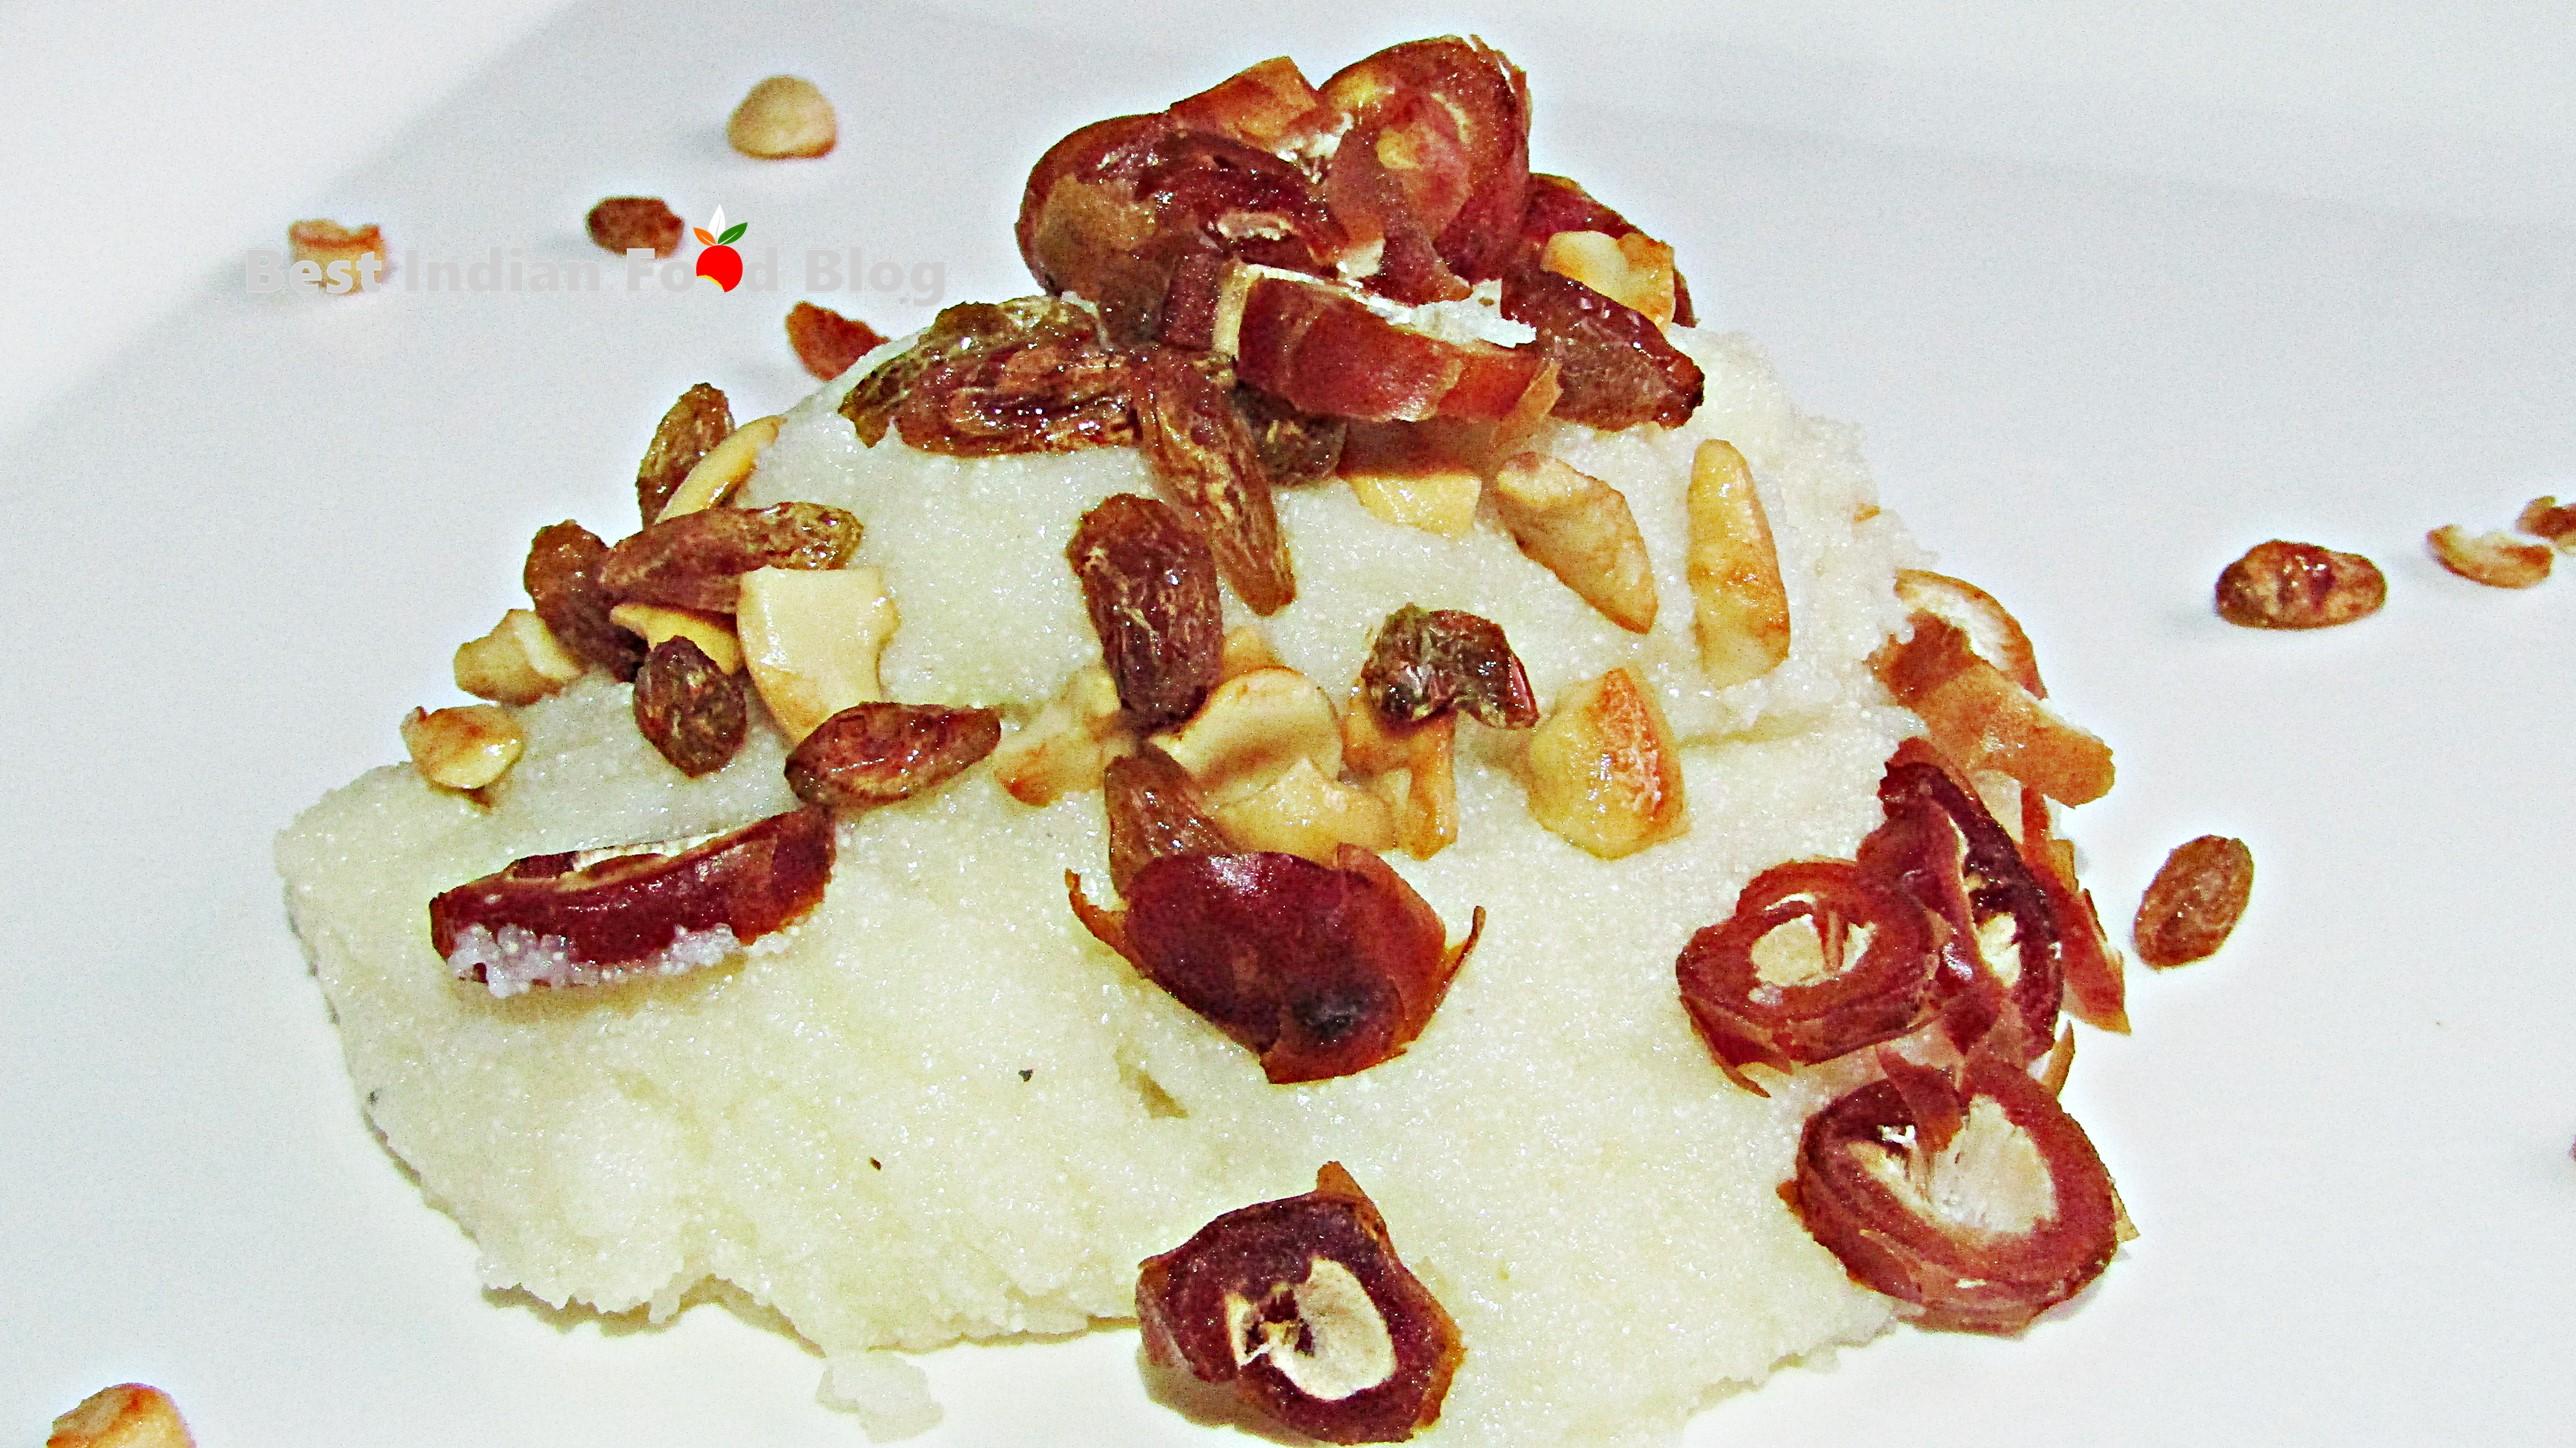 Ravo from Daman and Diu, India | Best Indian Food Blog | Semolina recipe